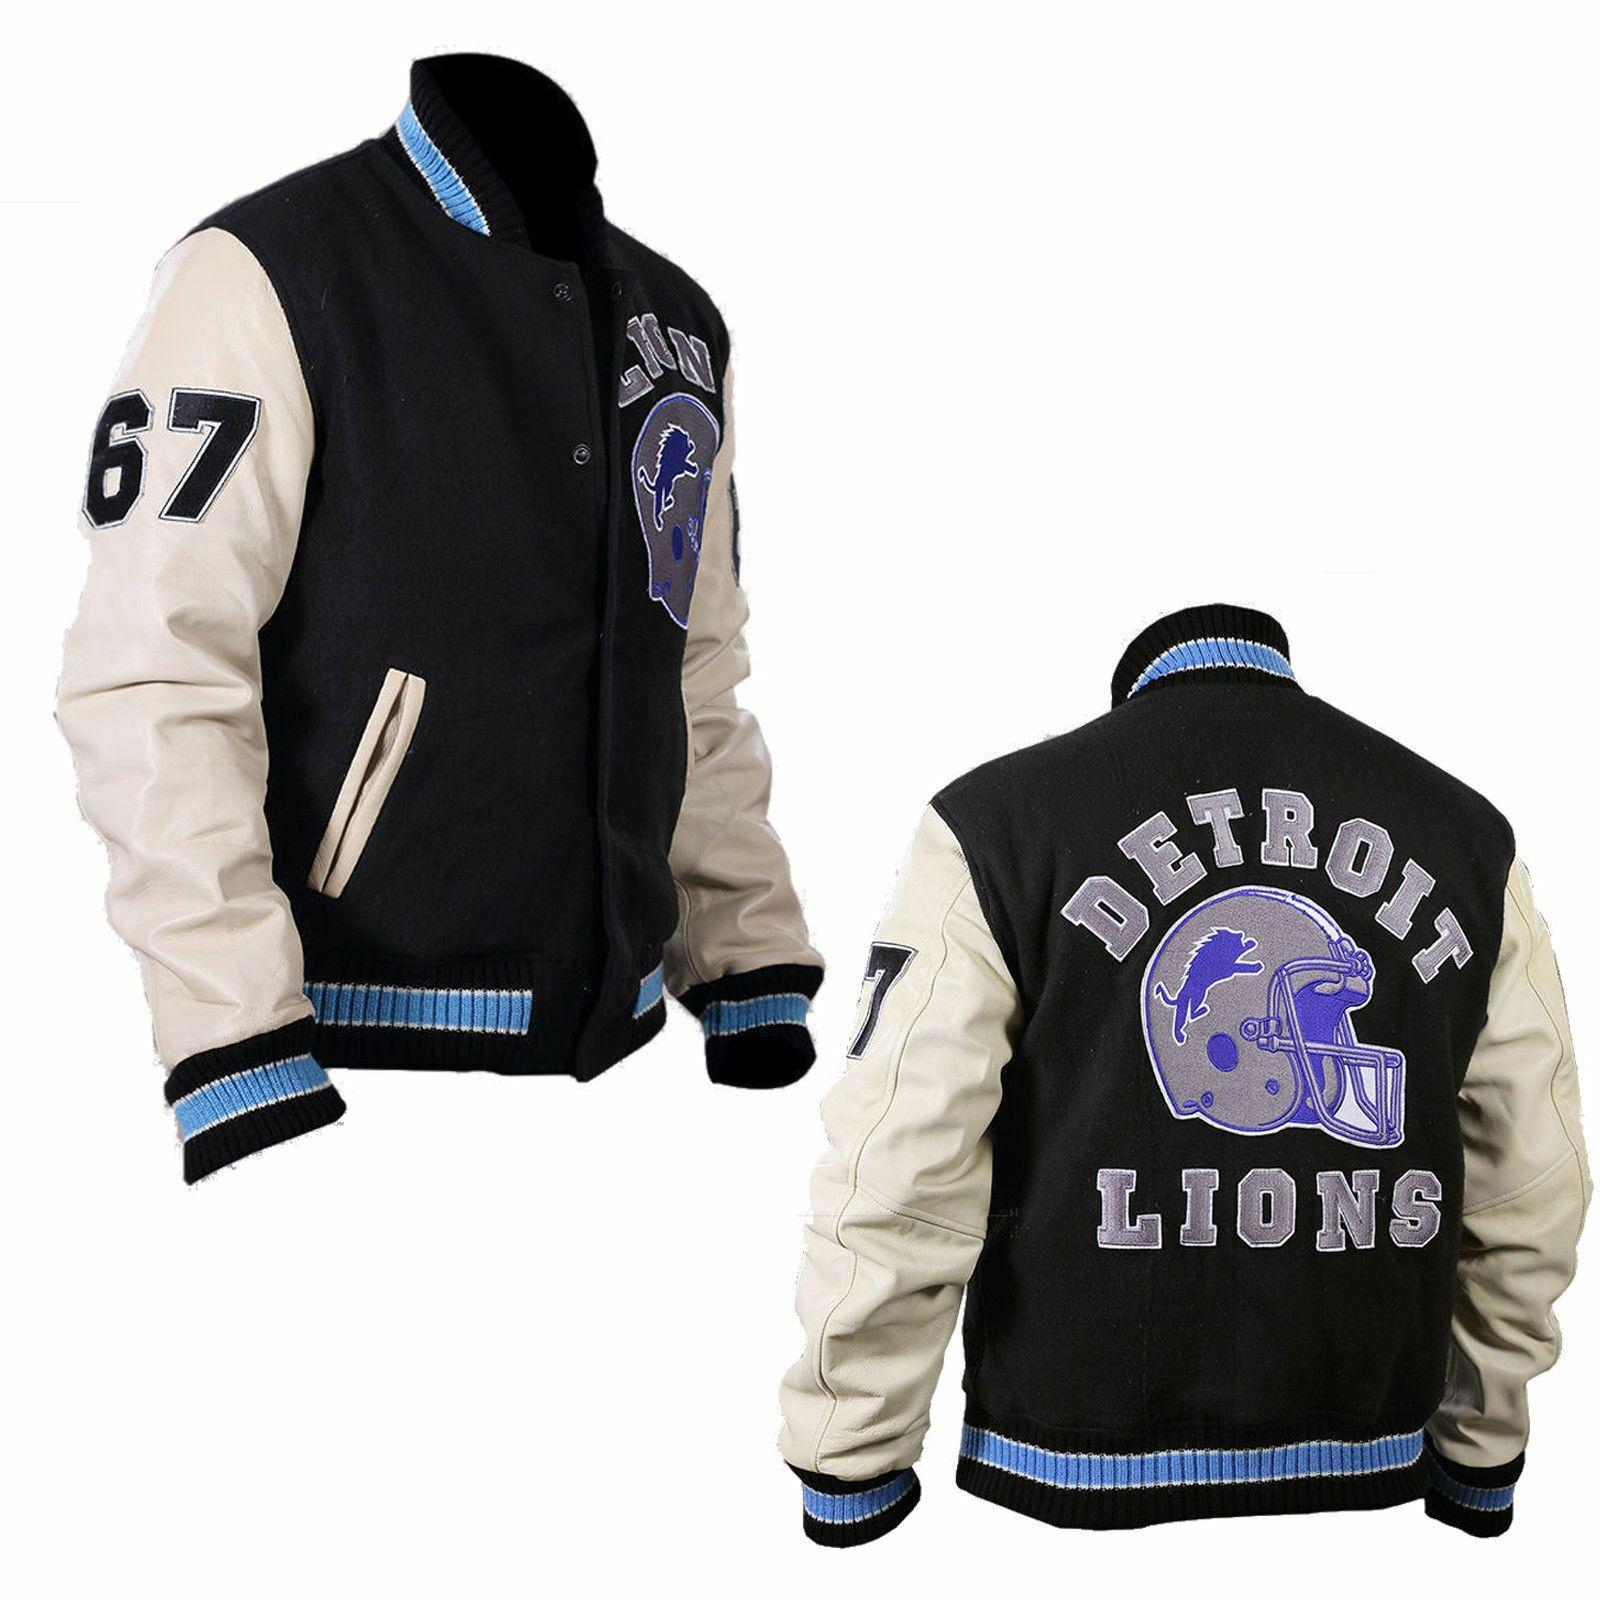 Beverly Hills Cop Eddie Murphy Axel Foley Detroit Lions Varsity Letterman Jacket Ebay In 2021 Collegejacke Detroit Lions Eddie Murphy